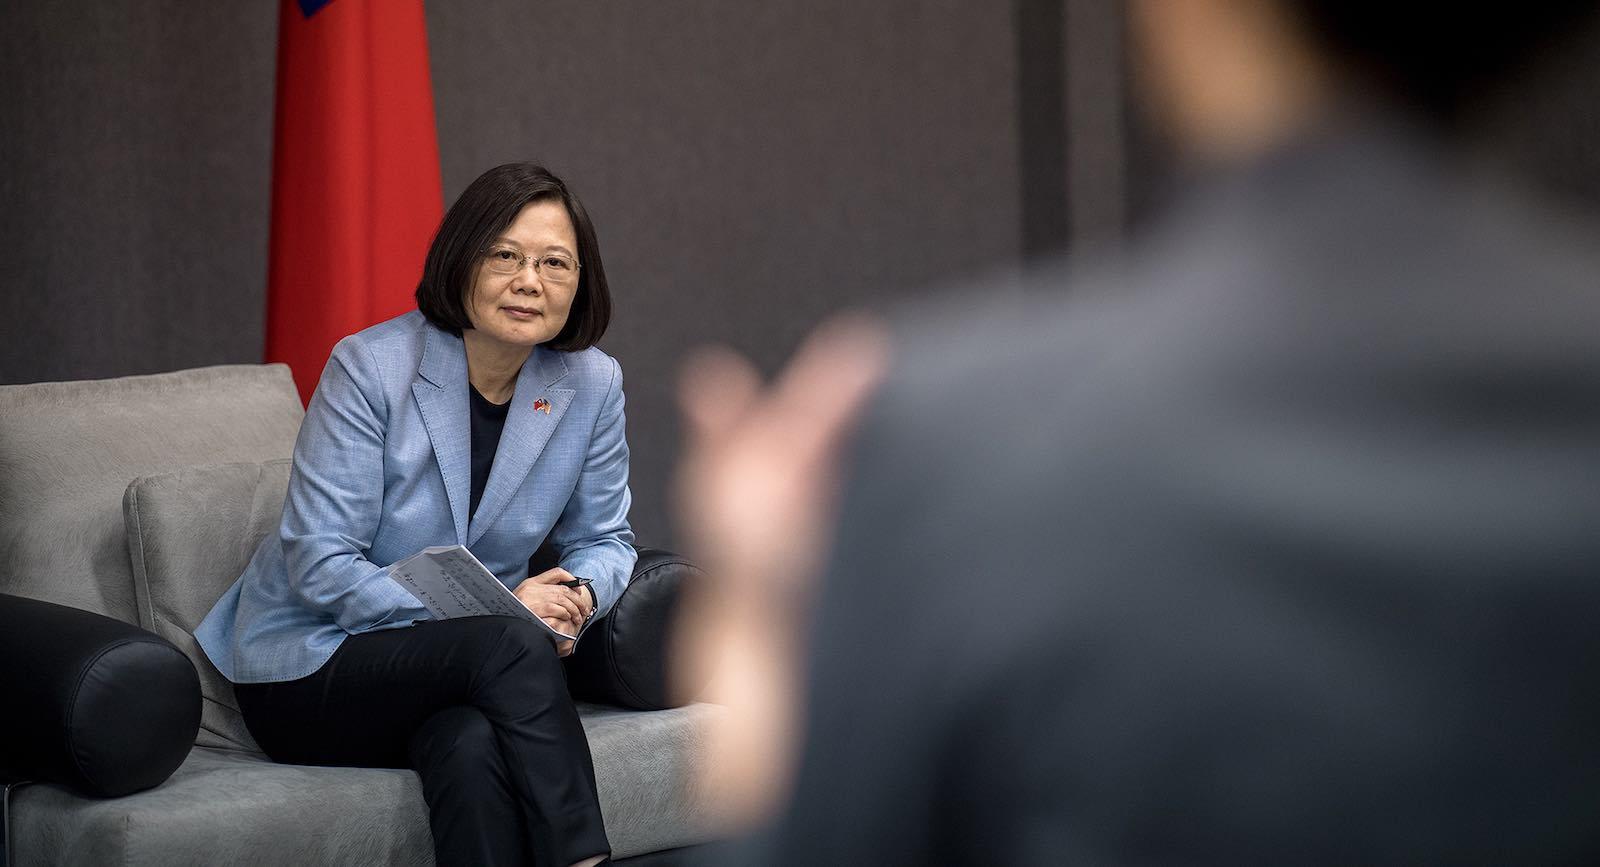 Taiwan President Tsai Ing-wen (Photo: Taiwan Presidential office/Flickr)